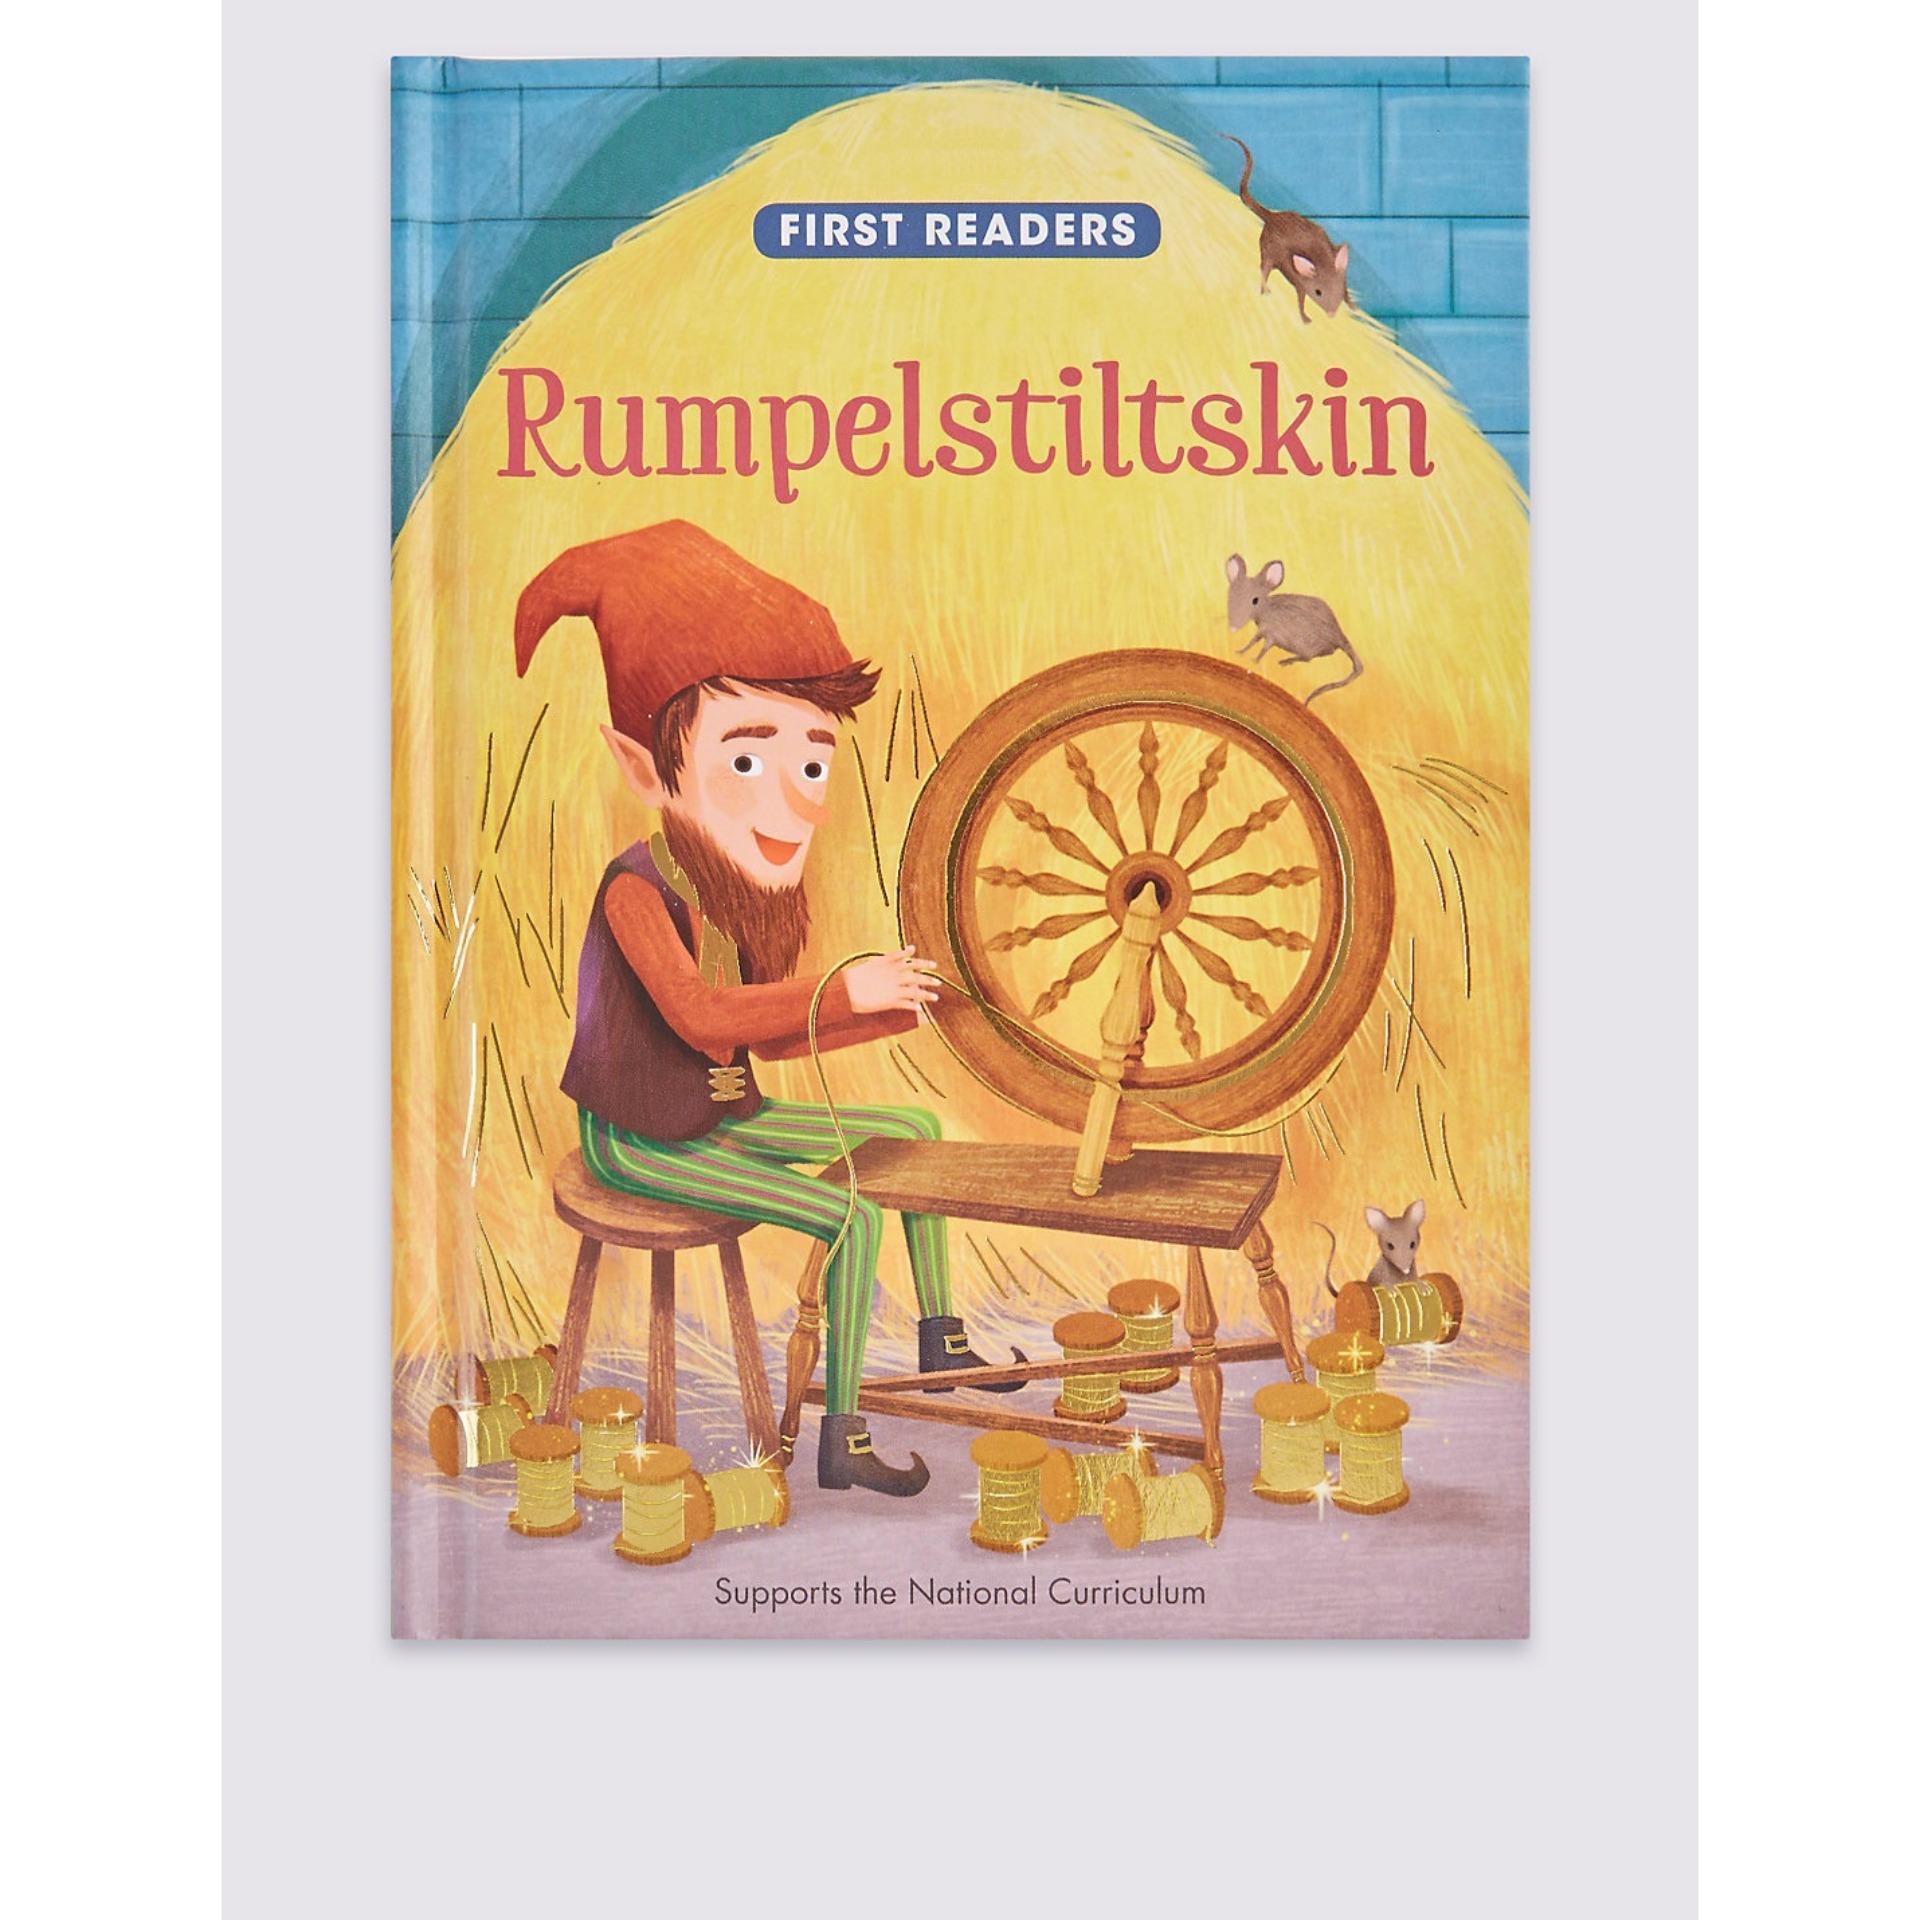 First Readers Rumpelstiltskin